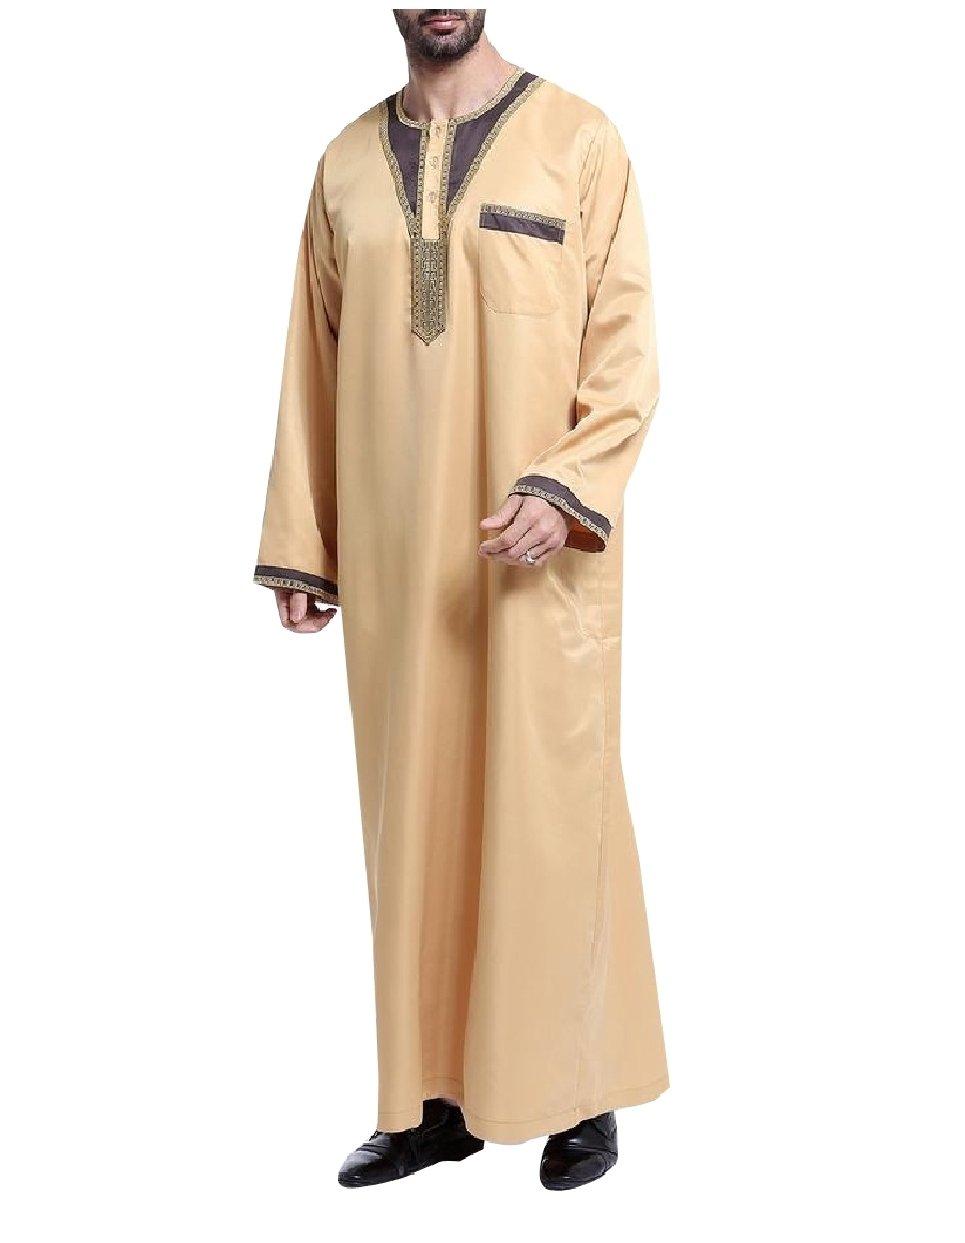 SportsX Men's Saudi Arabia Traditional Long Sleeve Cotton Muslim Thobe Yellow XL